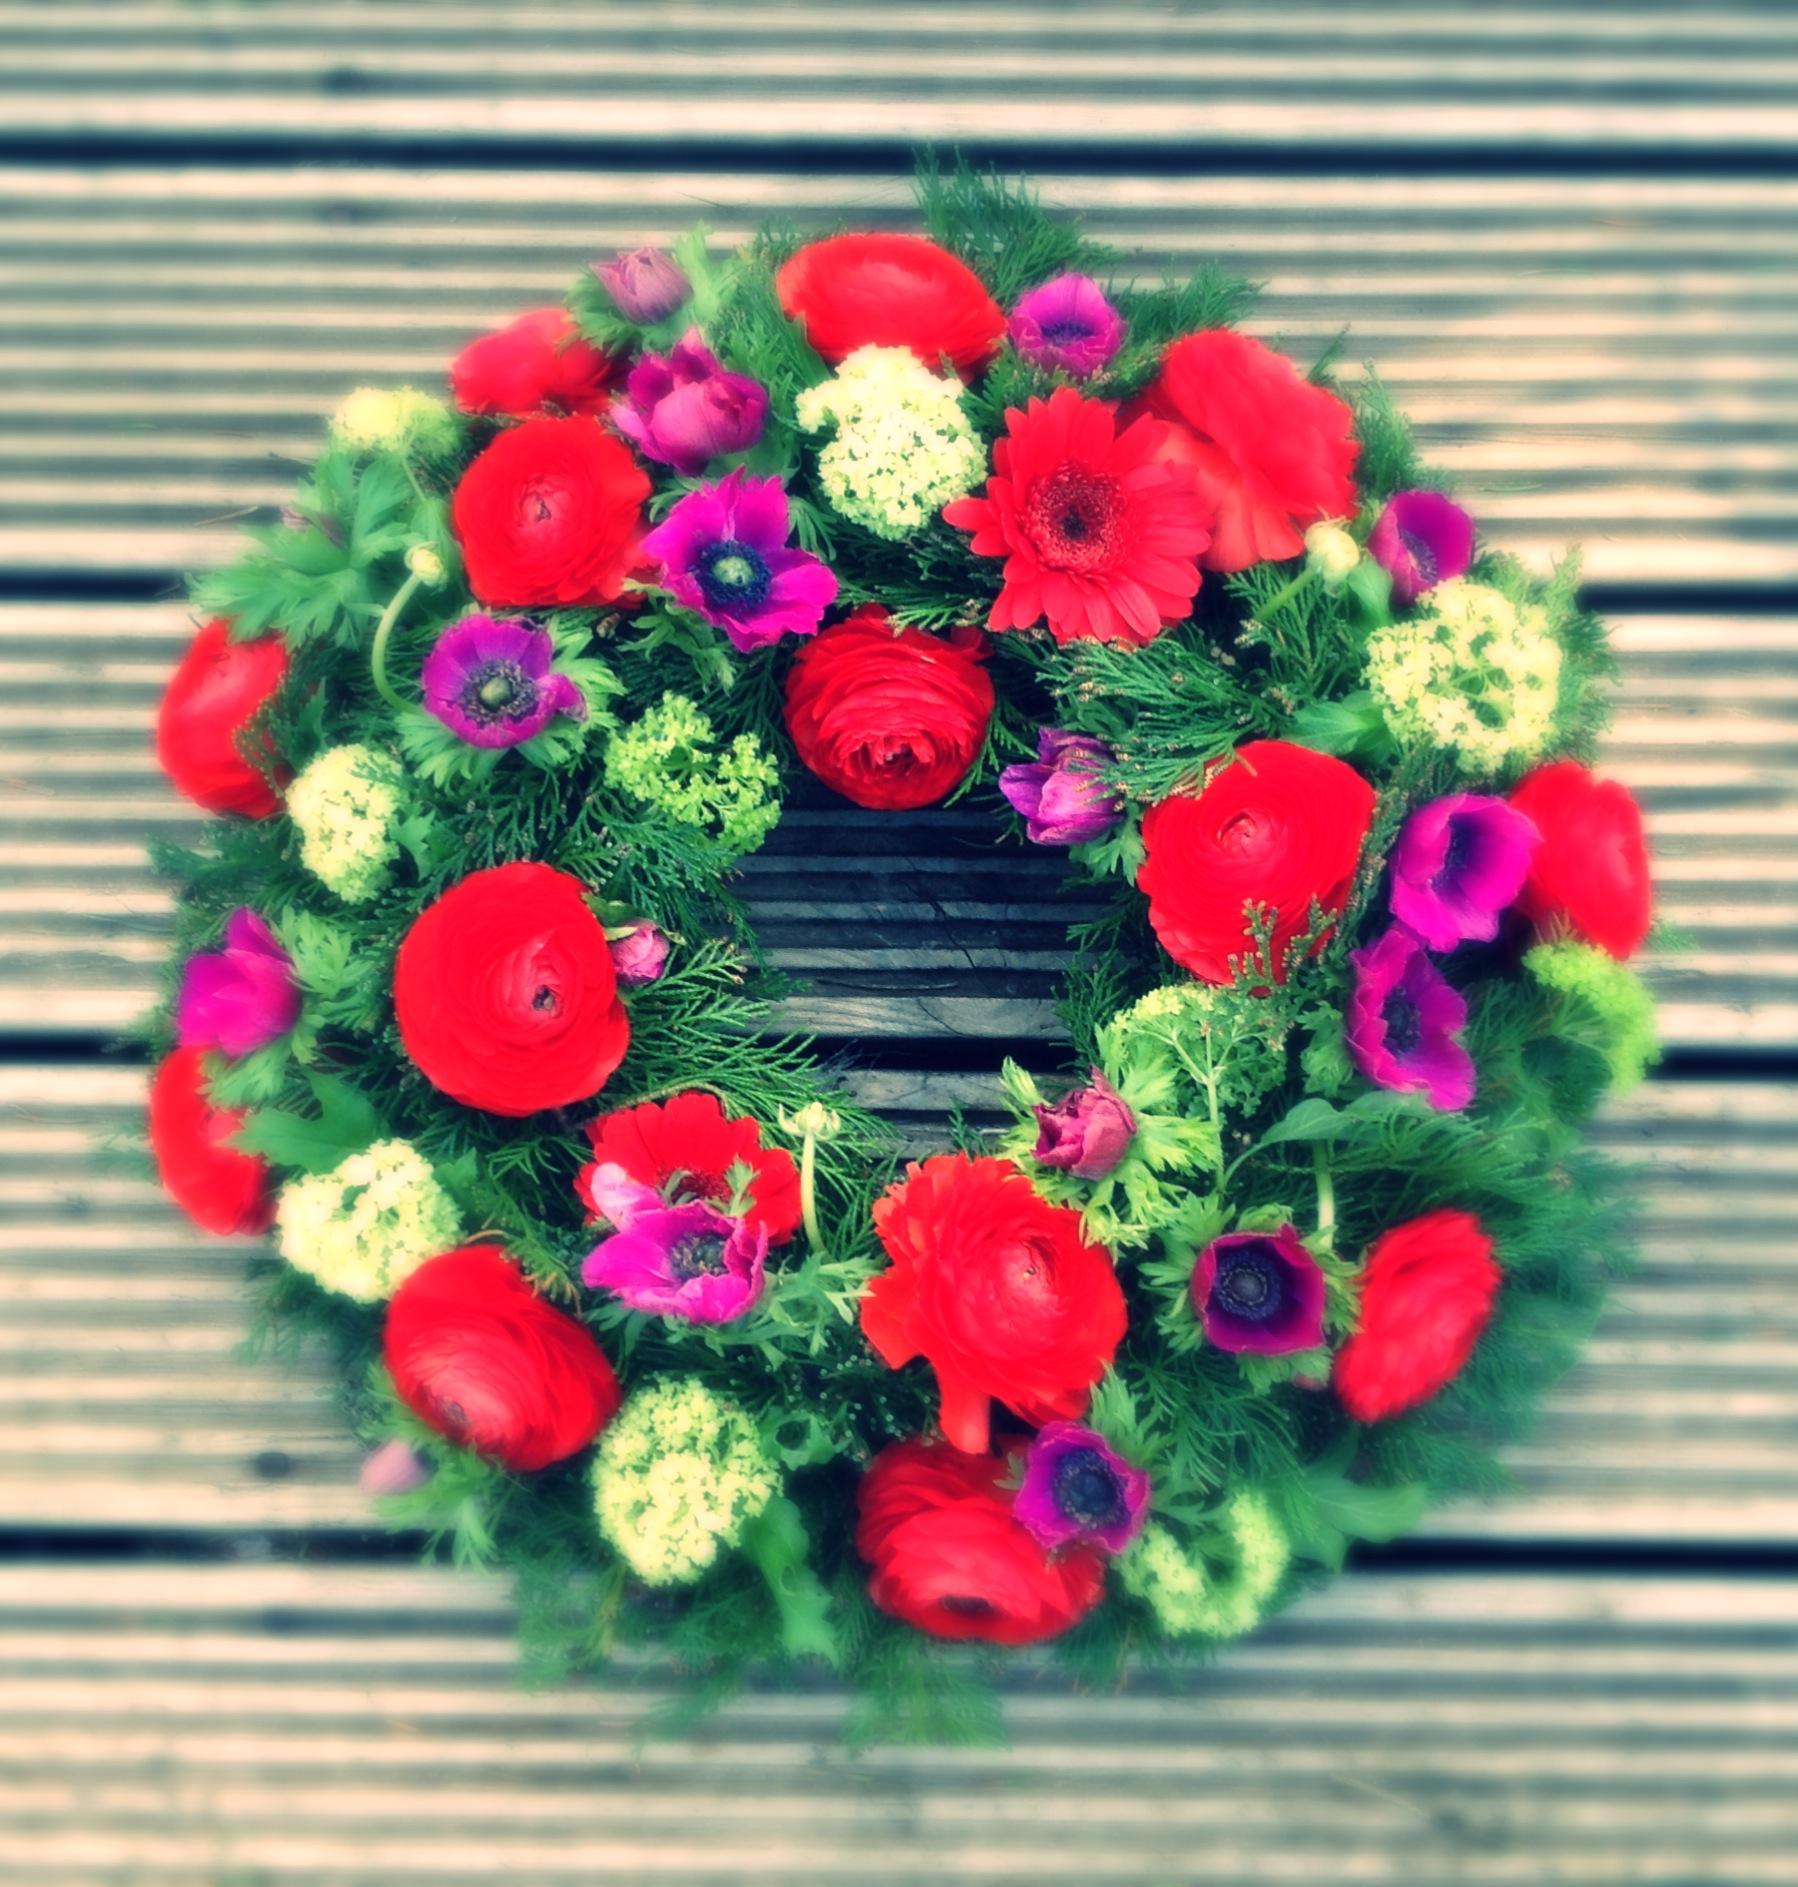 Funeral wreaths in dumfries galloway wreaths gallery izmirmasajfo